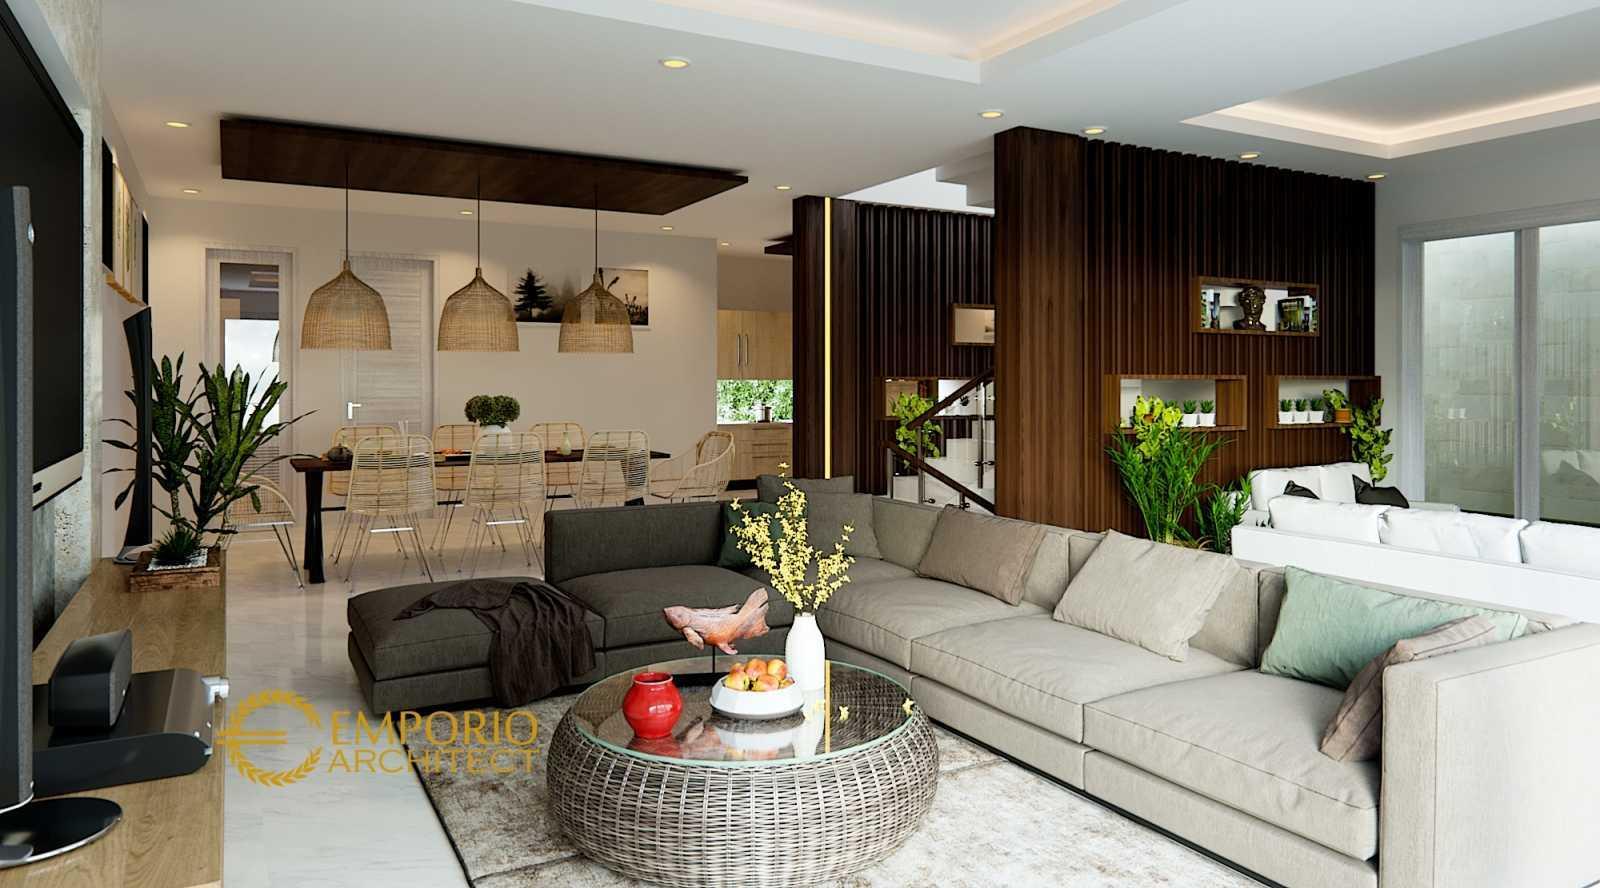 Emporio Architect Jasa Arsitek Makassar Desain Rumah Modern Tropis 633 @ Makassar Makassar, Kota Makassar, Sulawesi Selatan, Indonesia Makassar, Kota Makassar, Sulawesi Selatan, Indonesia Emporio-Architect-Jasa-Arsitek-Makassar-Desain-Rumah-Modern-Tropis-633-Makassar  78985